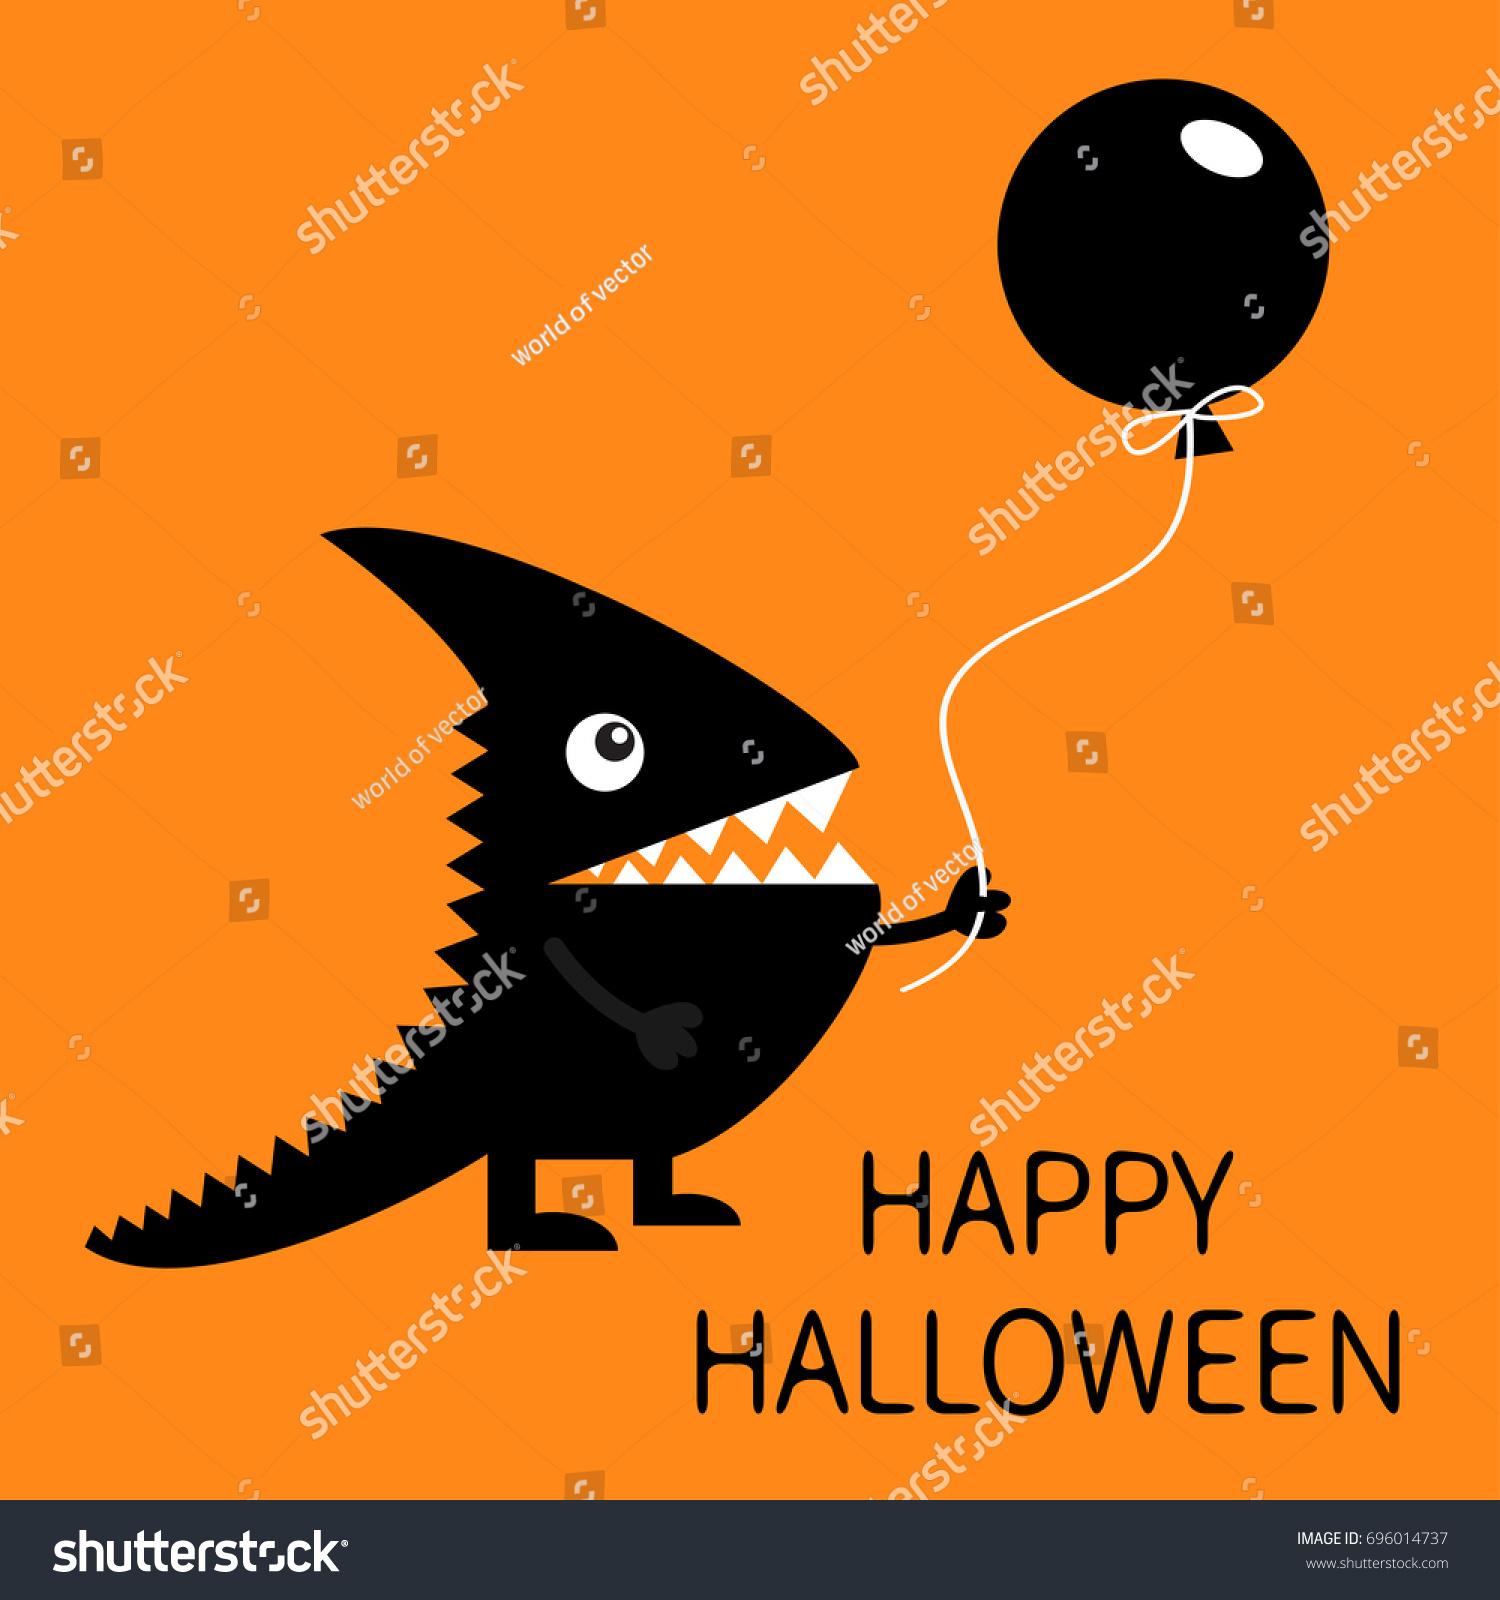 Happy Halloween Black Silhouette Monster Sharp Stock Vector